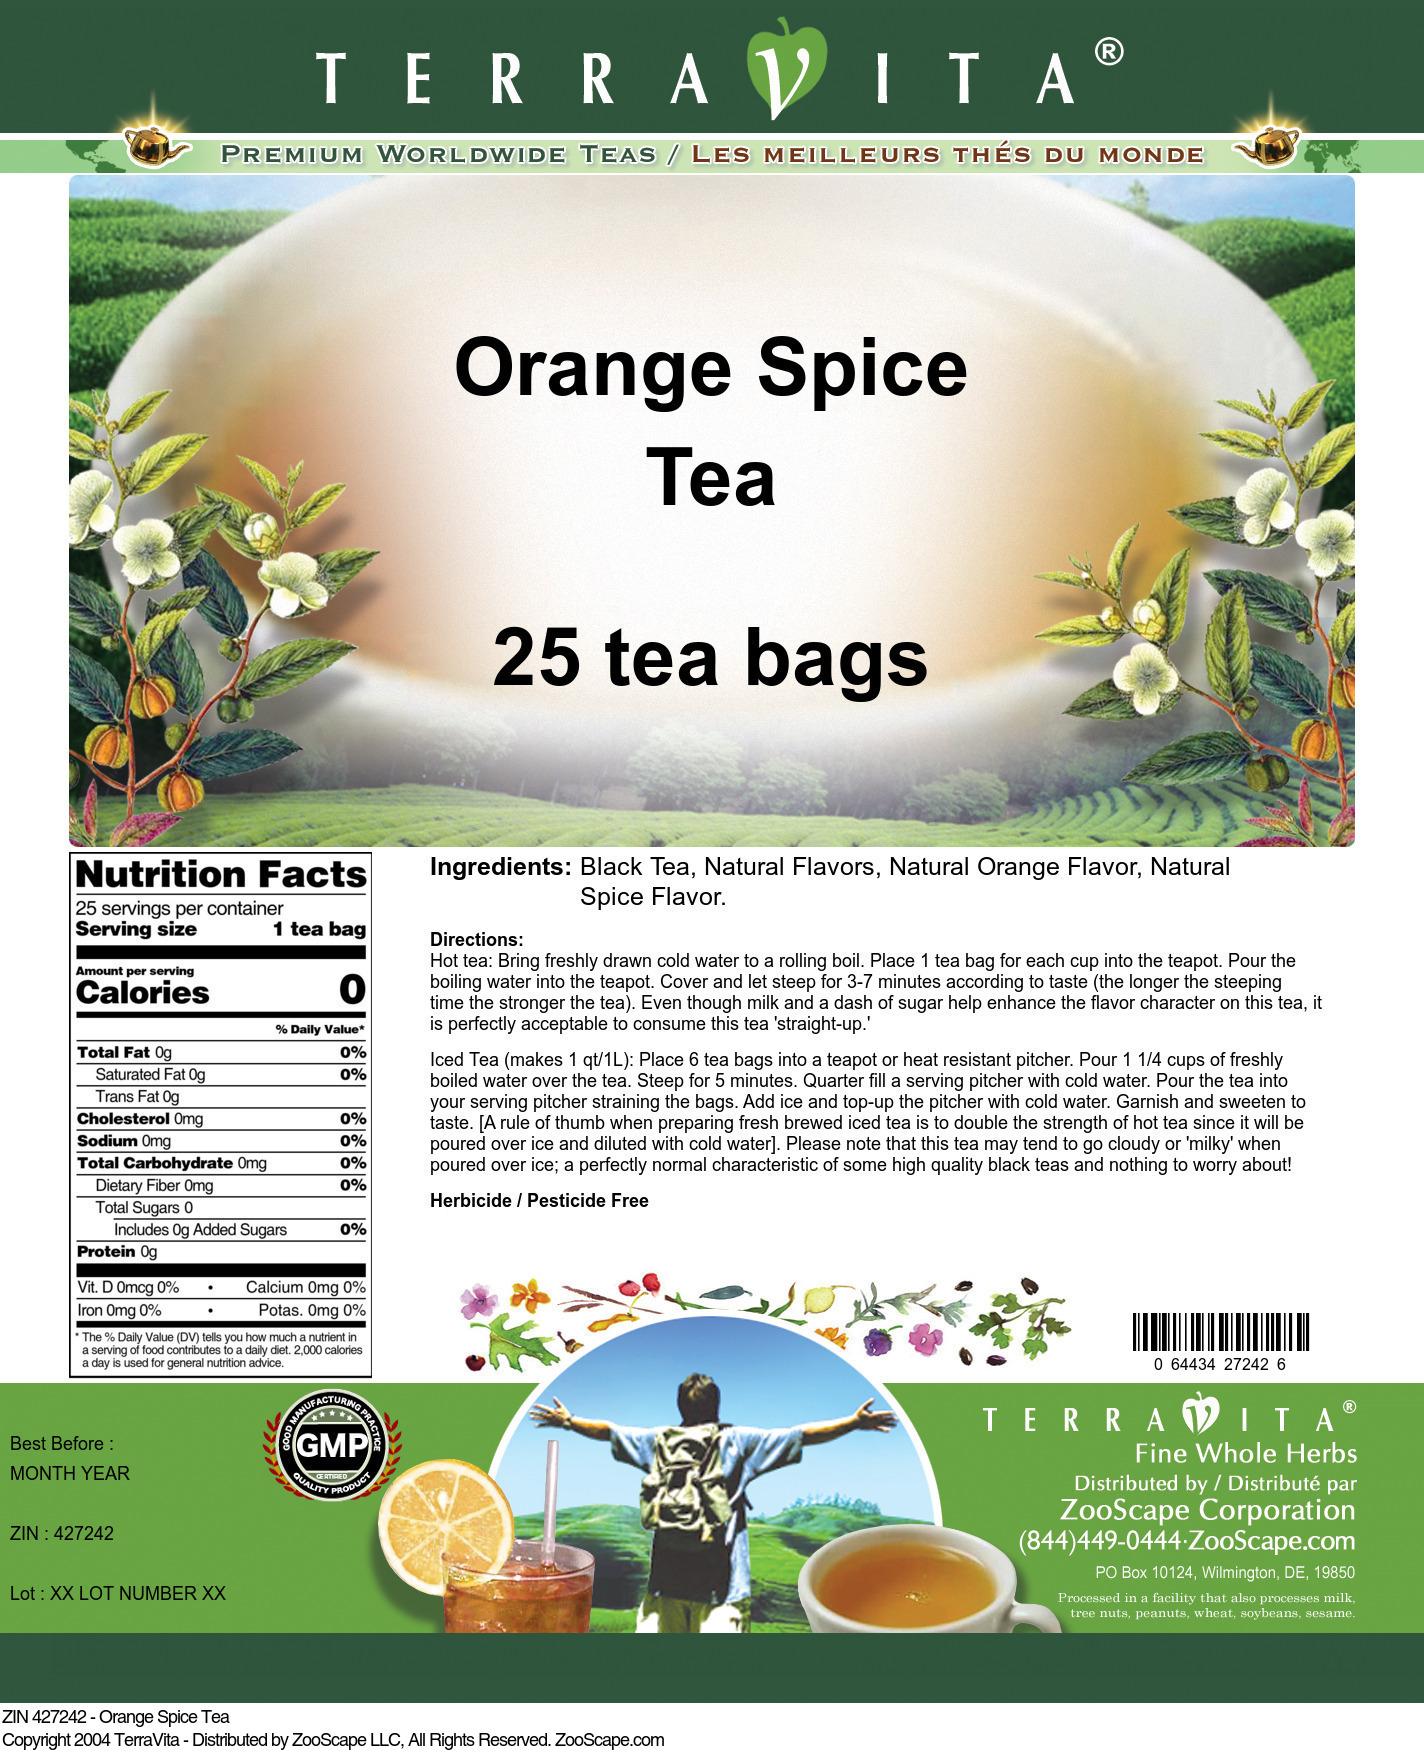 Orange Spice Tea